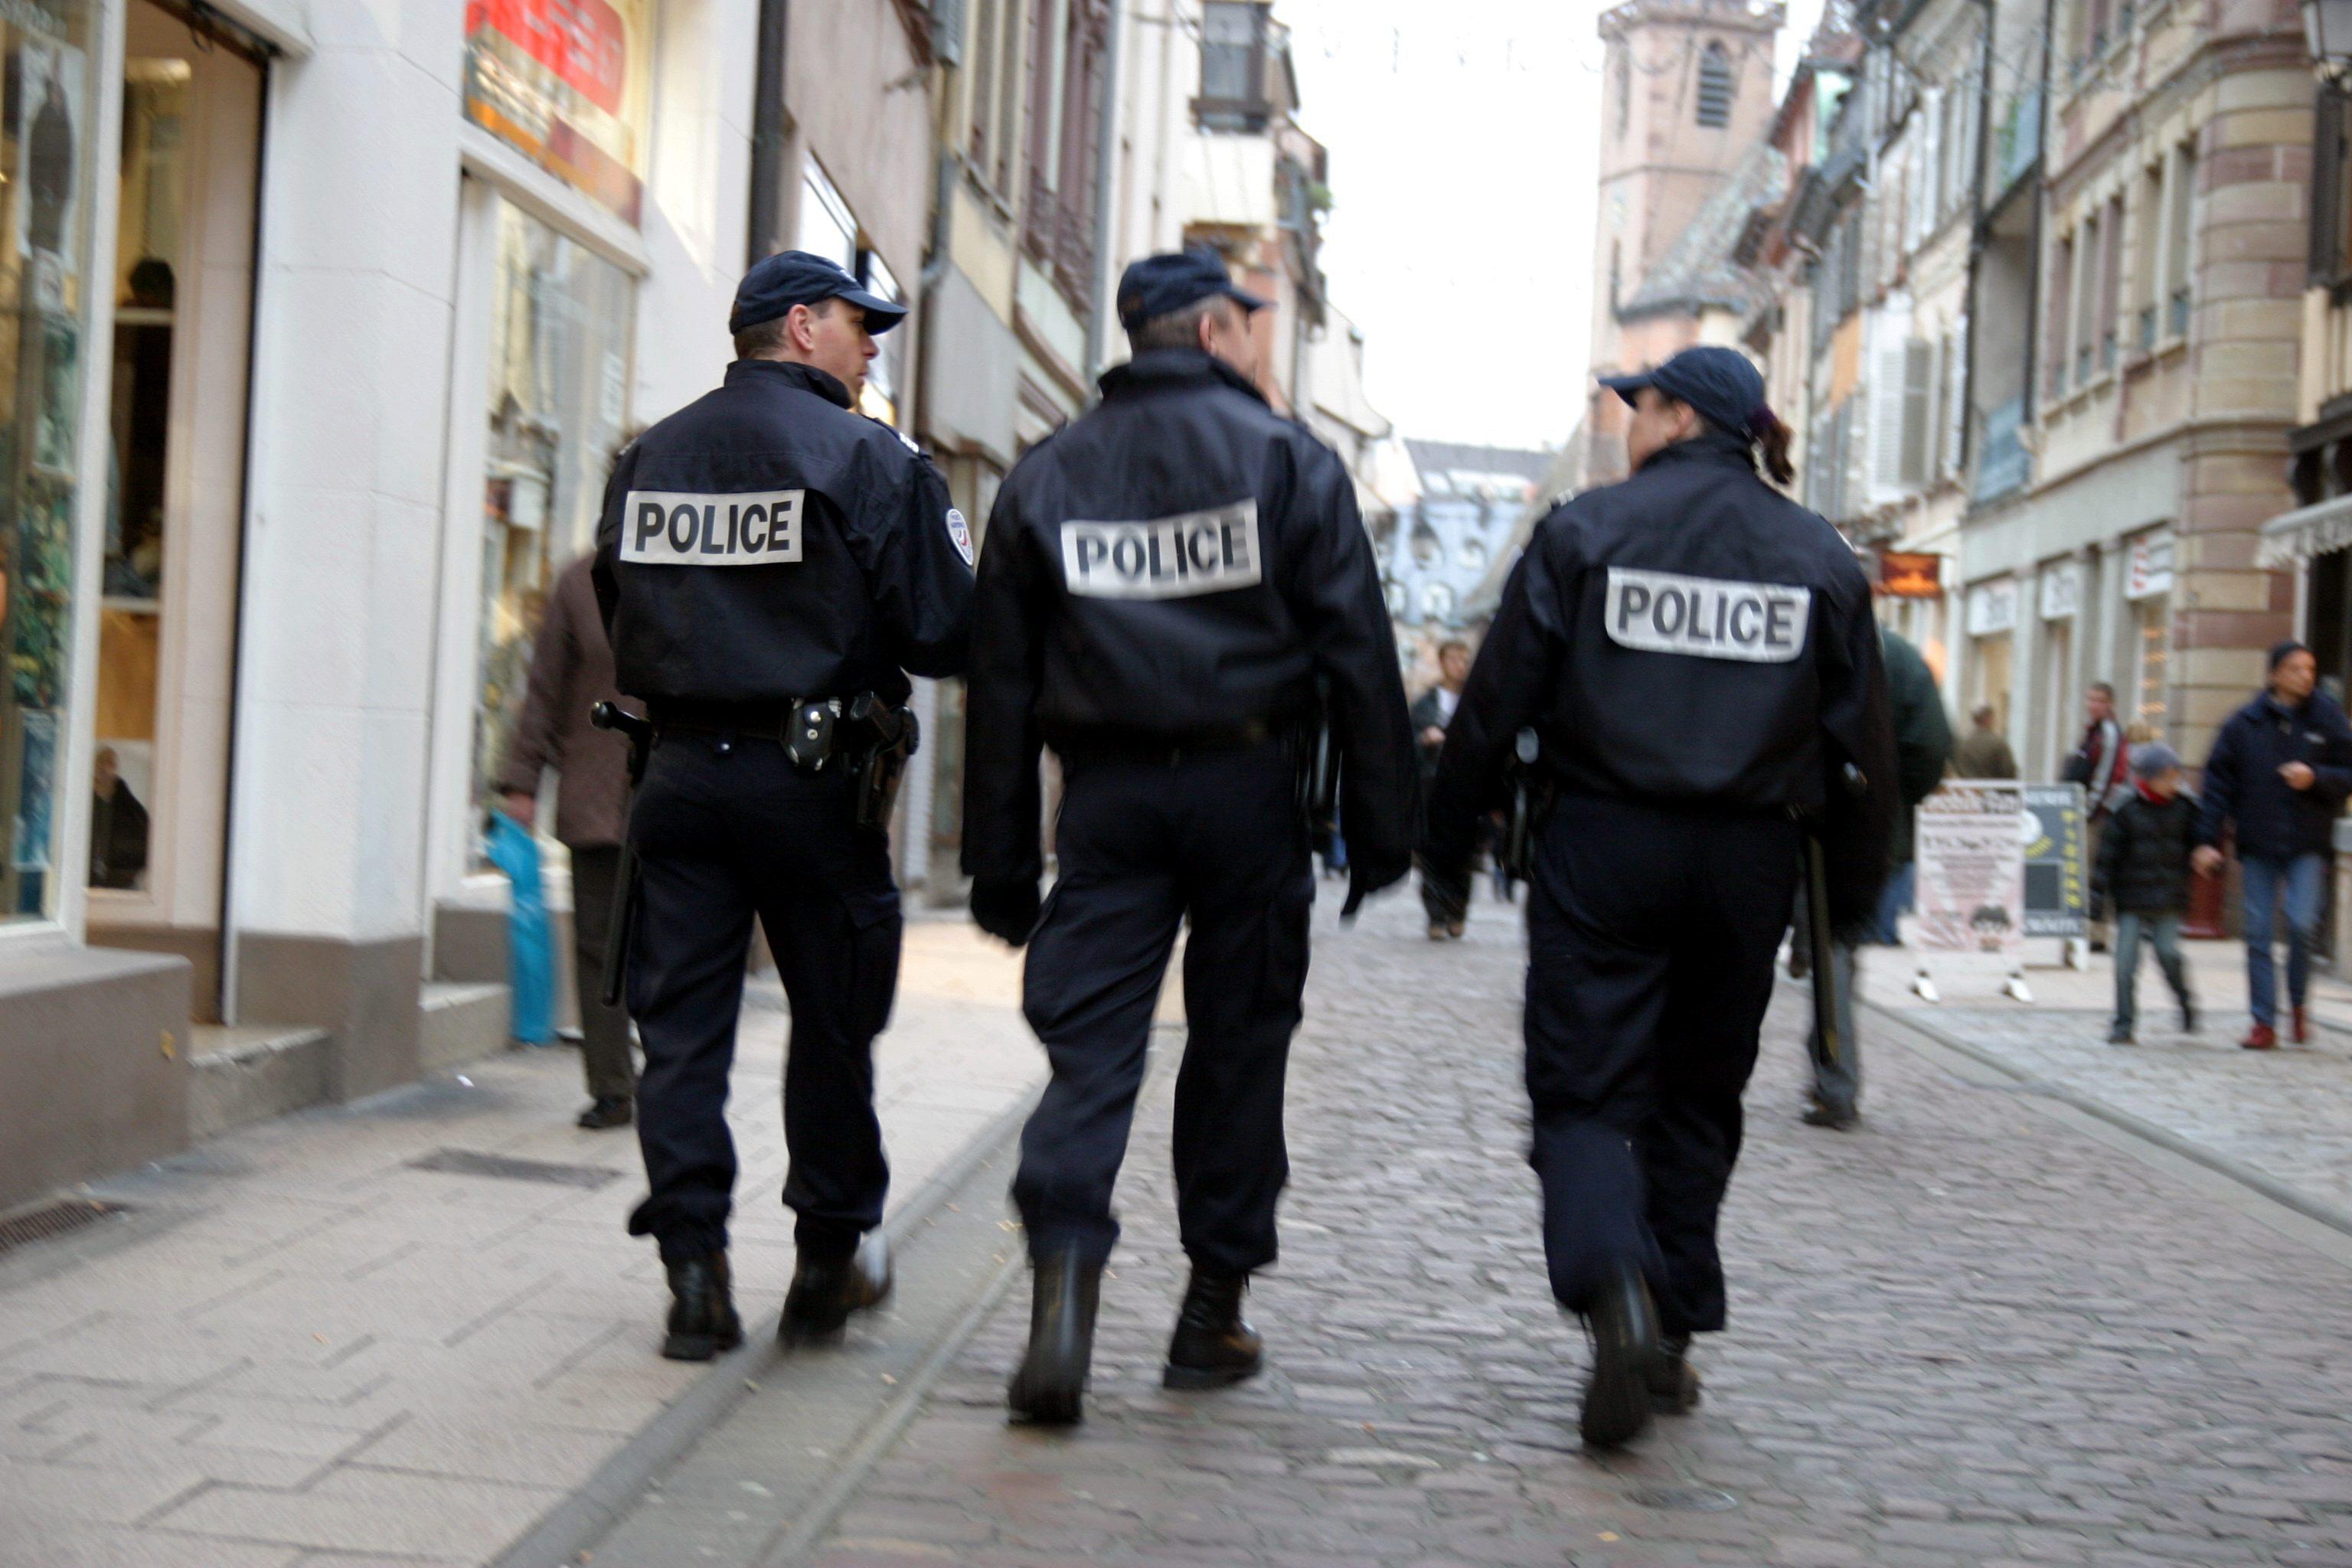 police - gps unit